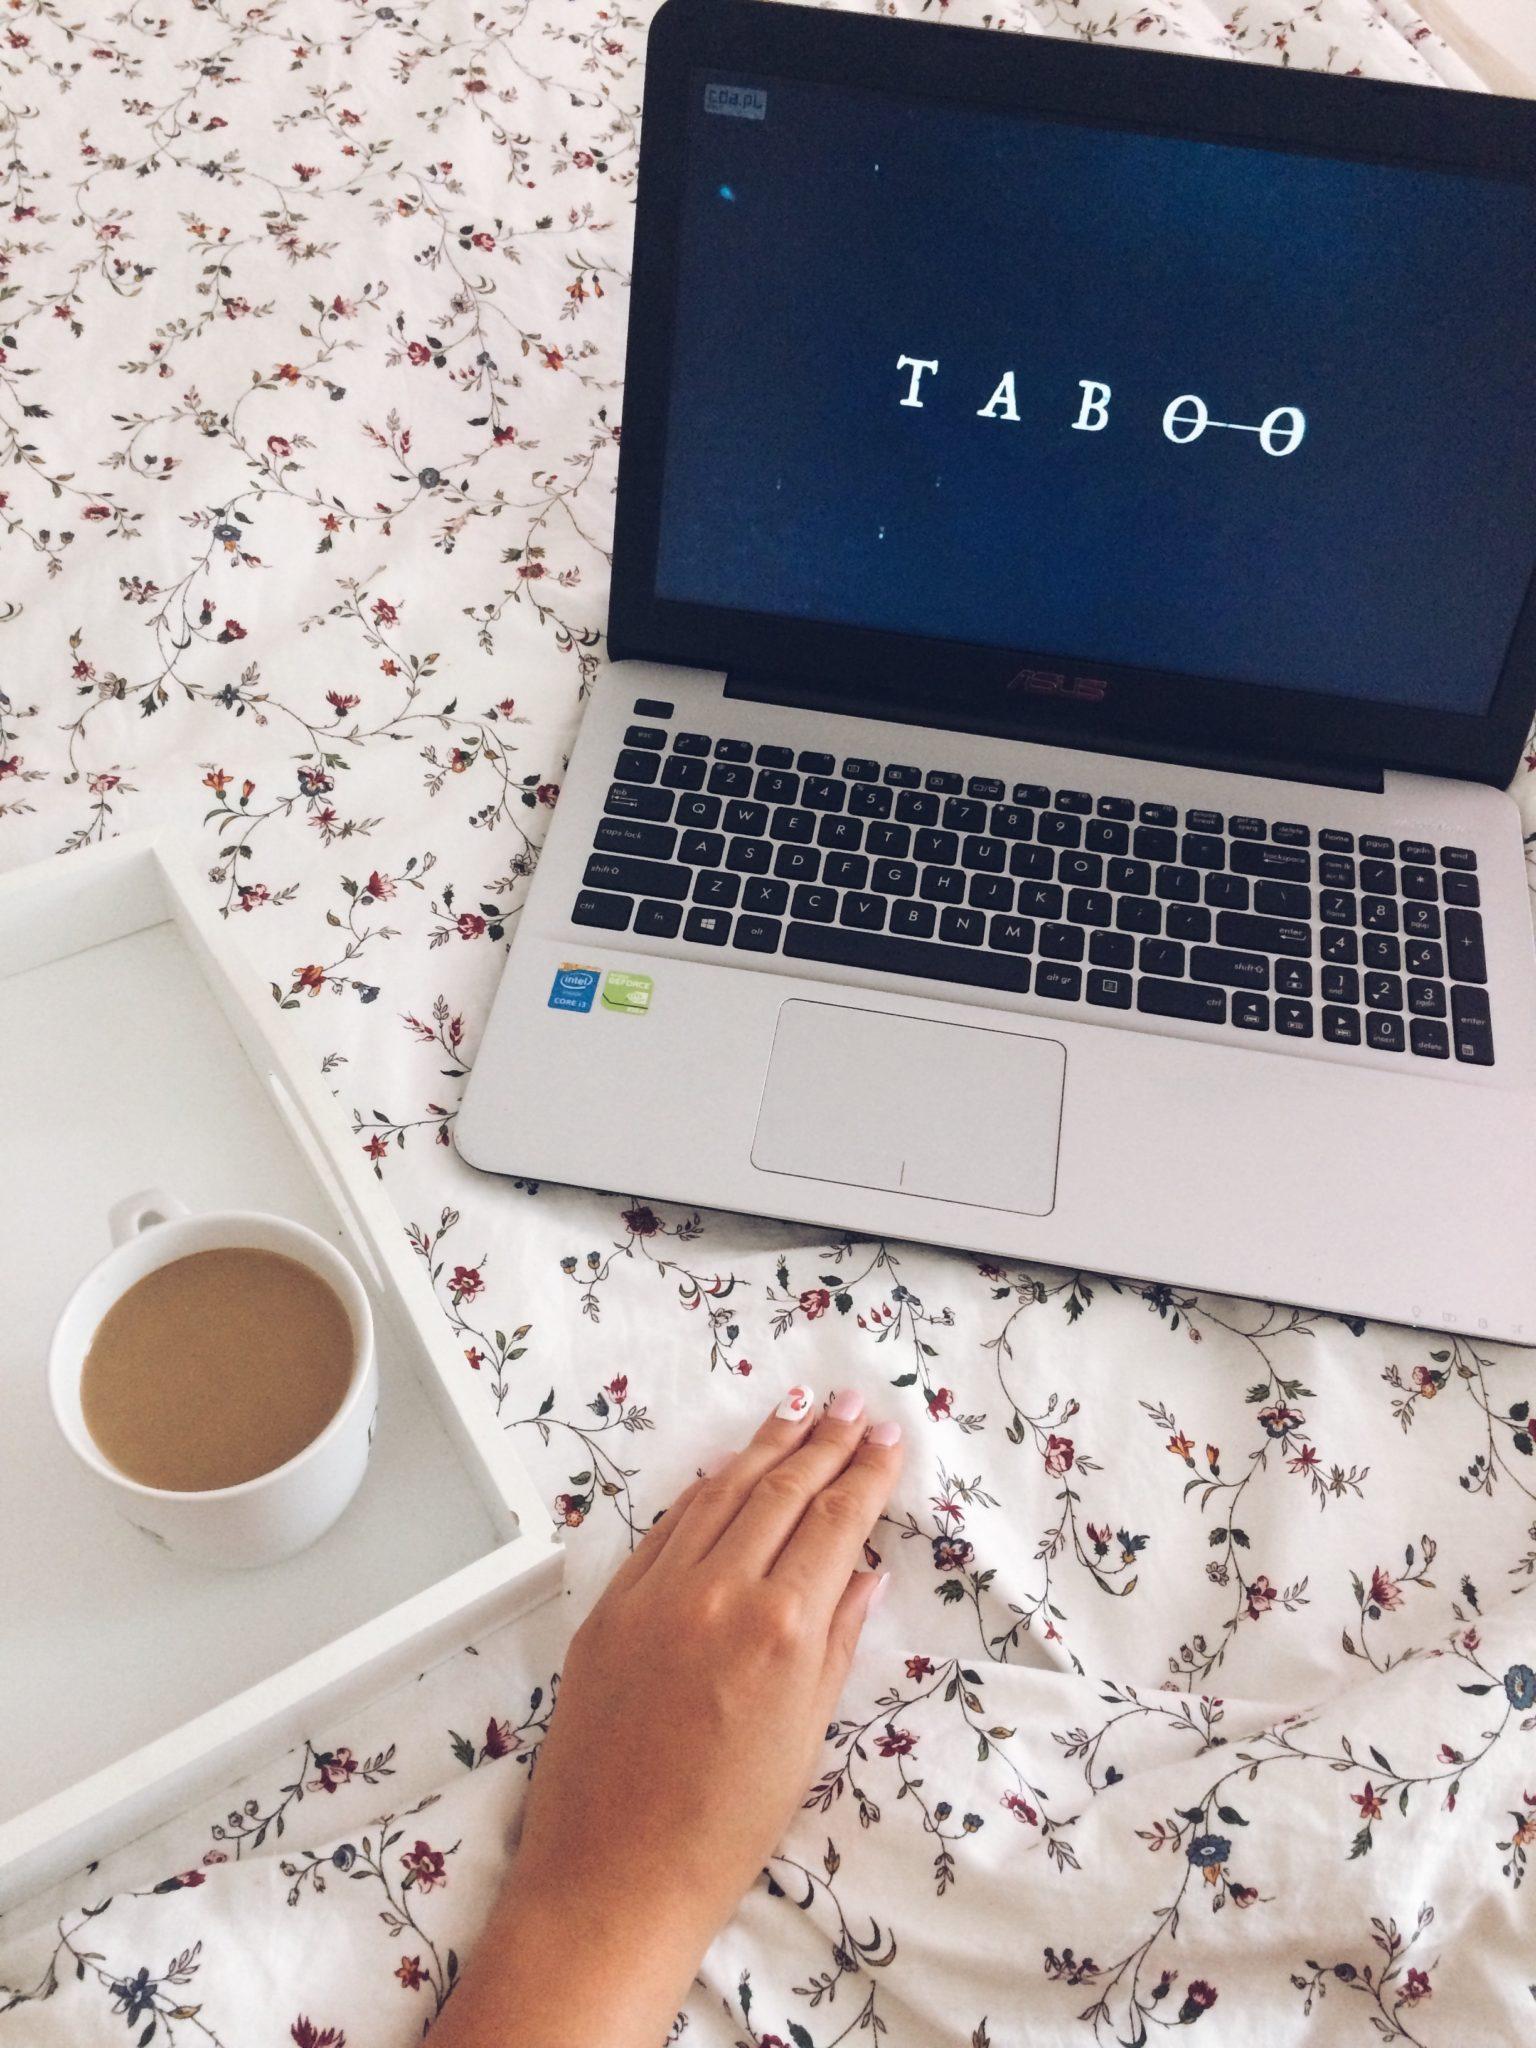 taboo serial tabu